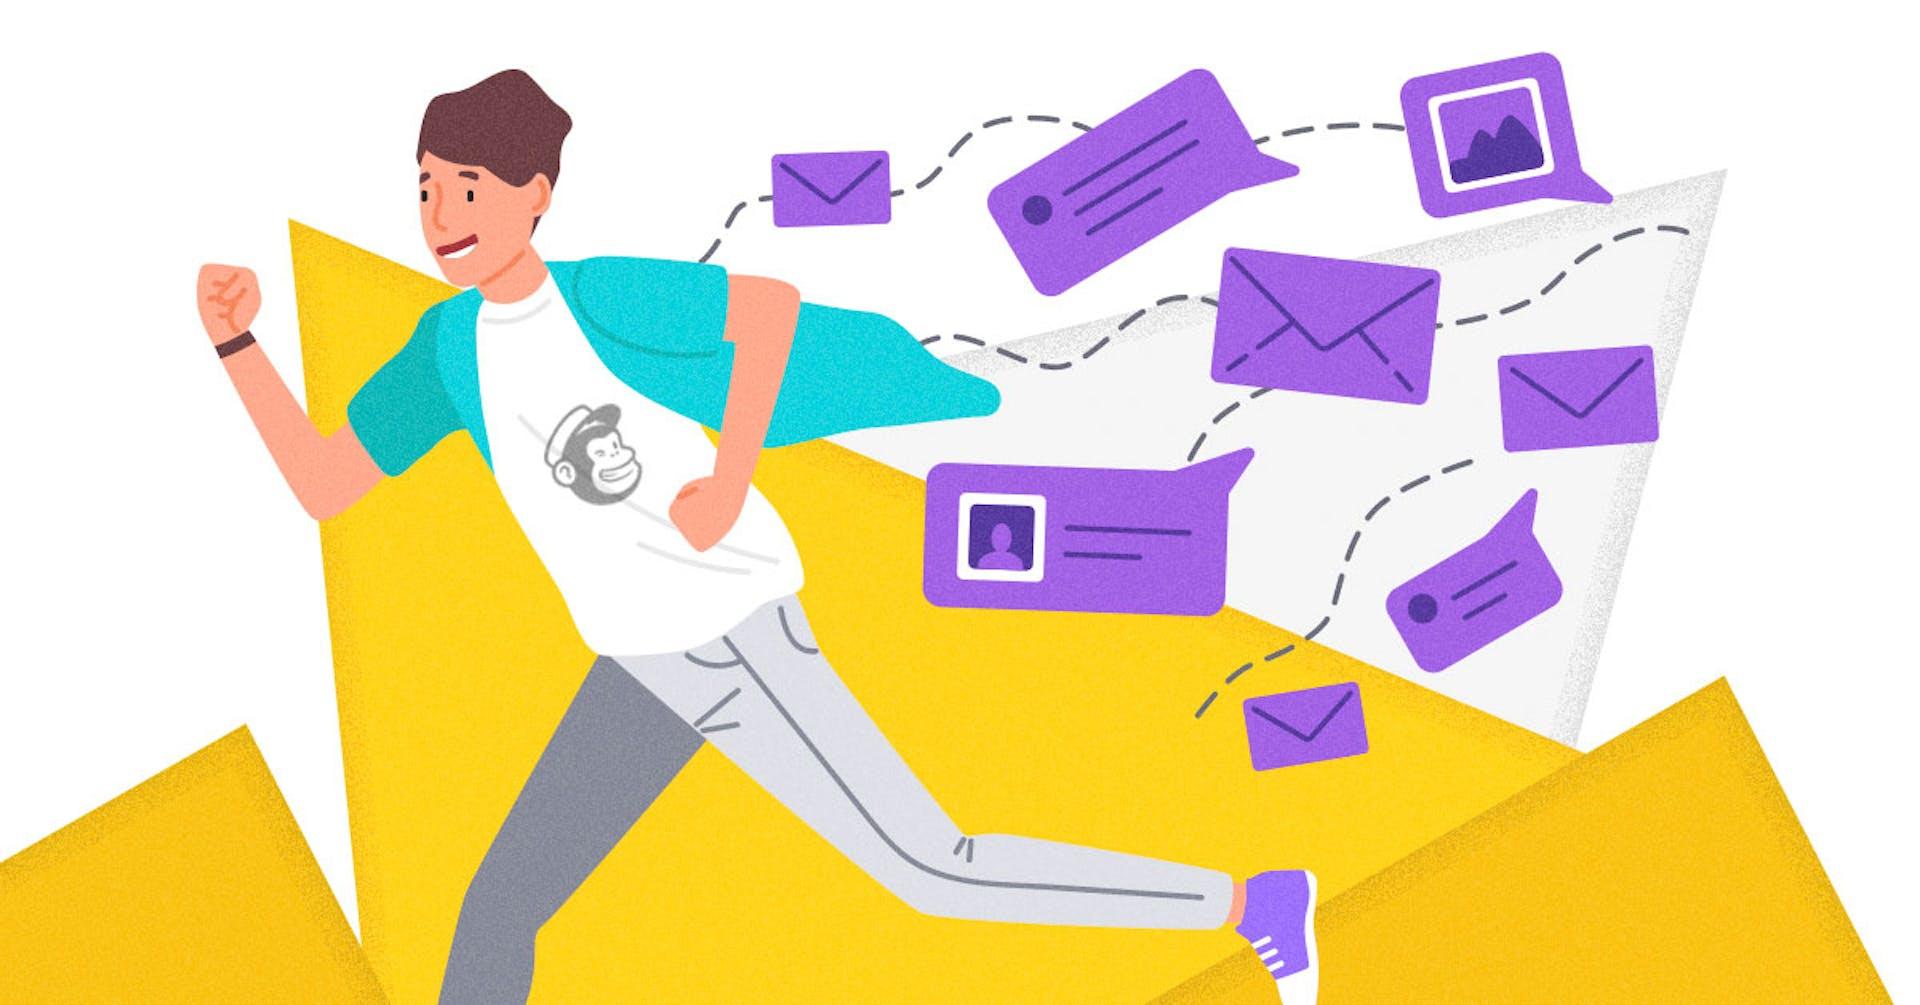 La magia del email Marketing ¿La conoces?